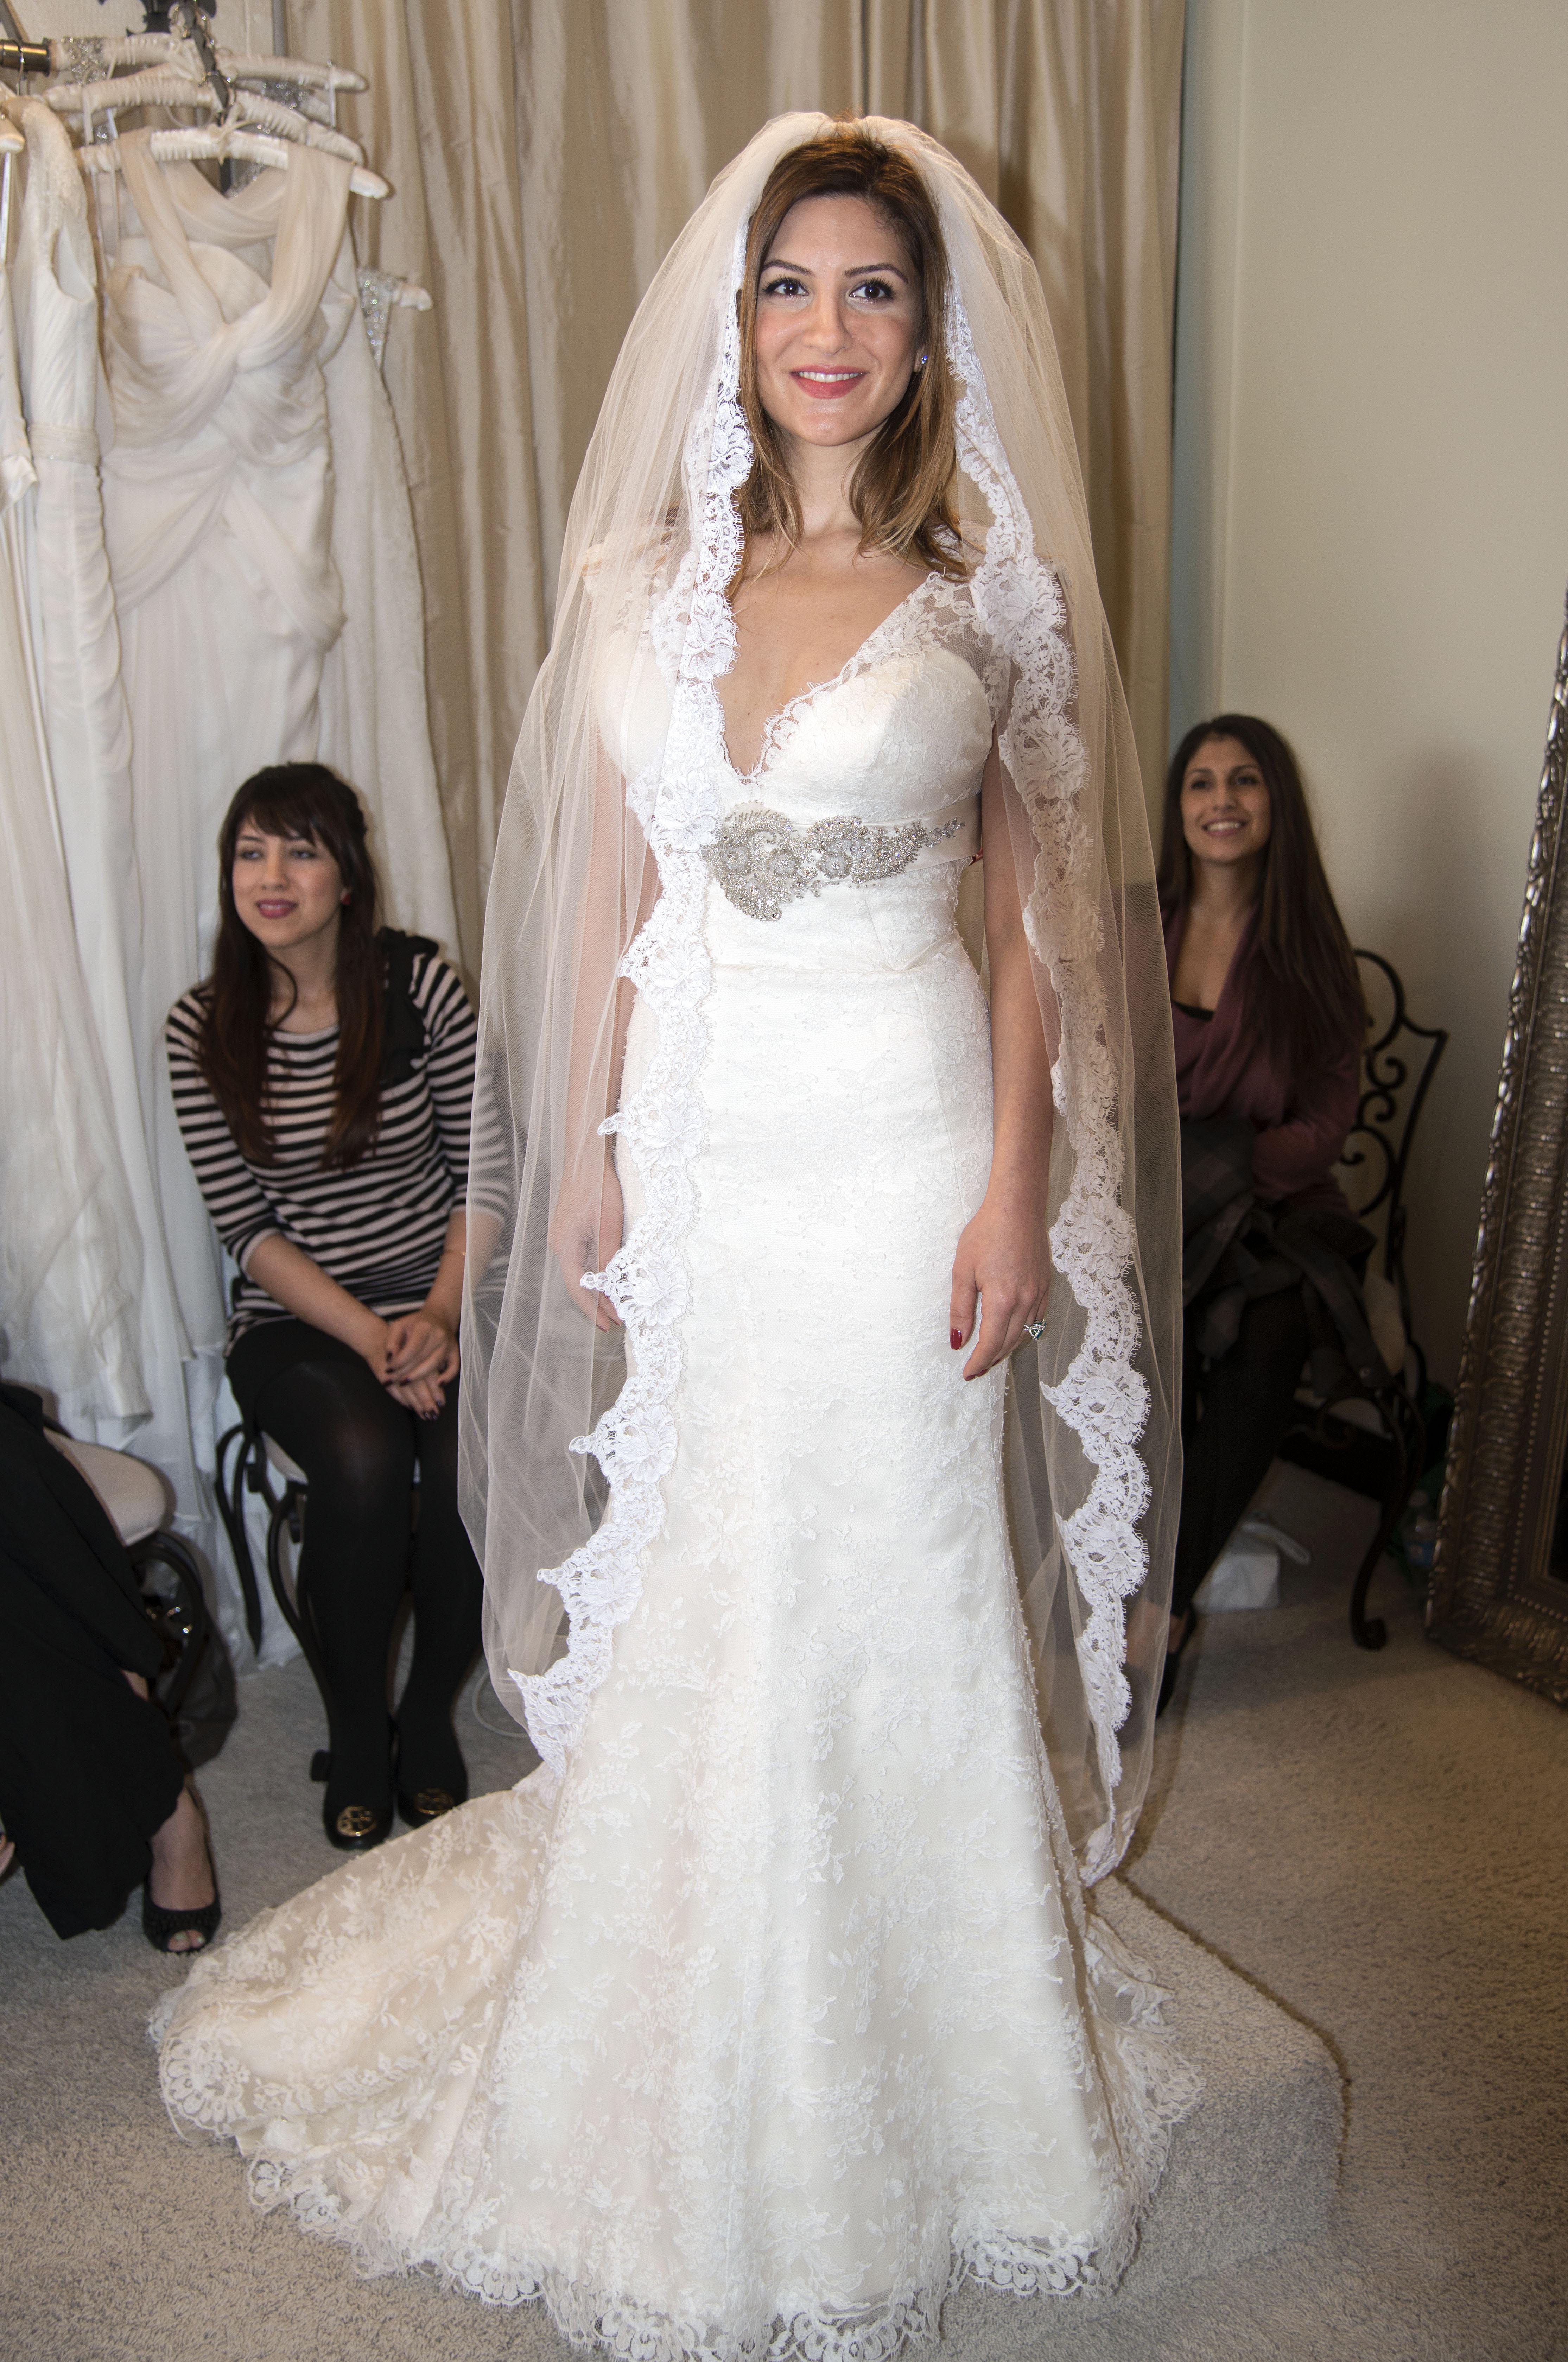 brie bella wedding dress bella's wedding ring Brie Bella Wedding Ring Rings